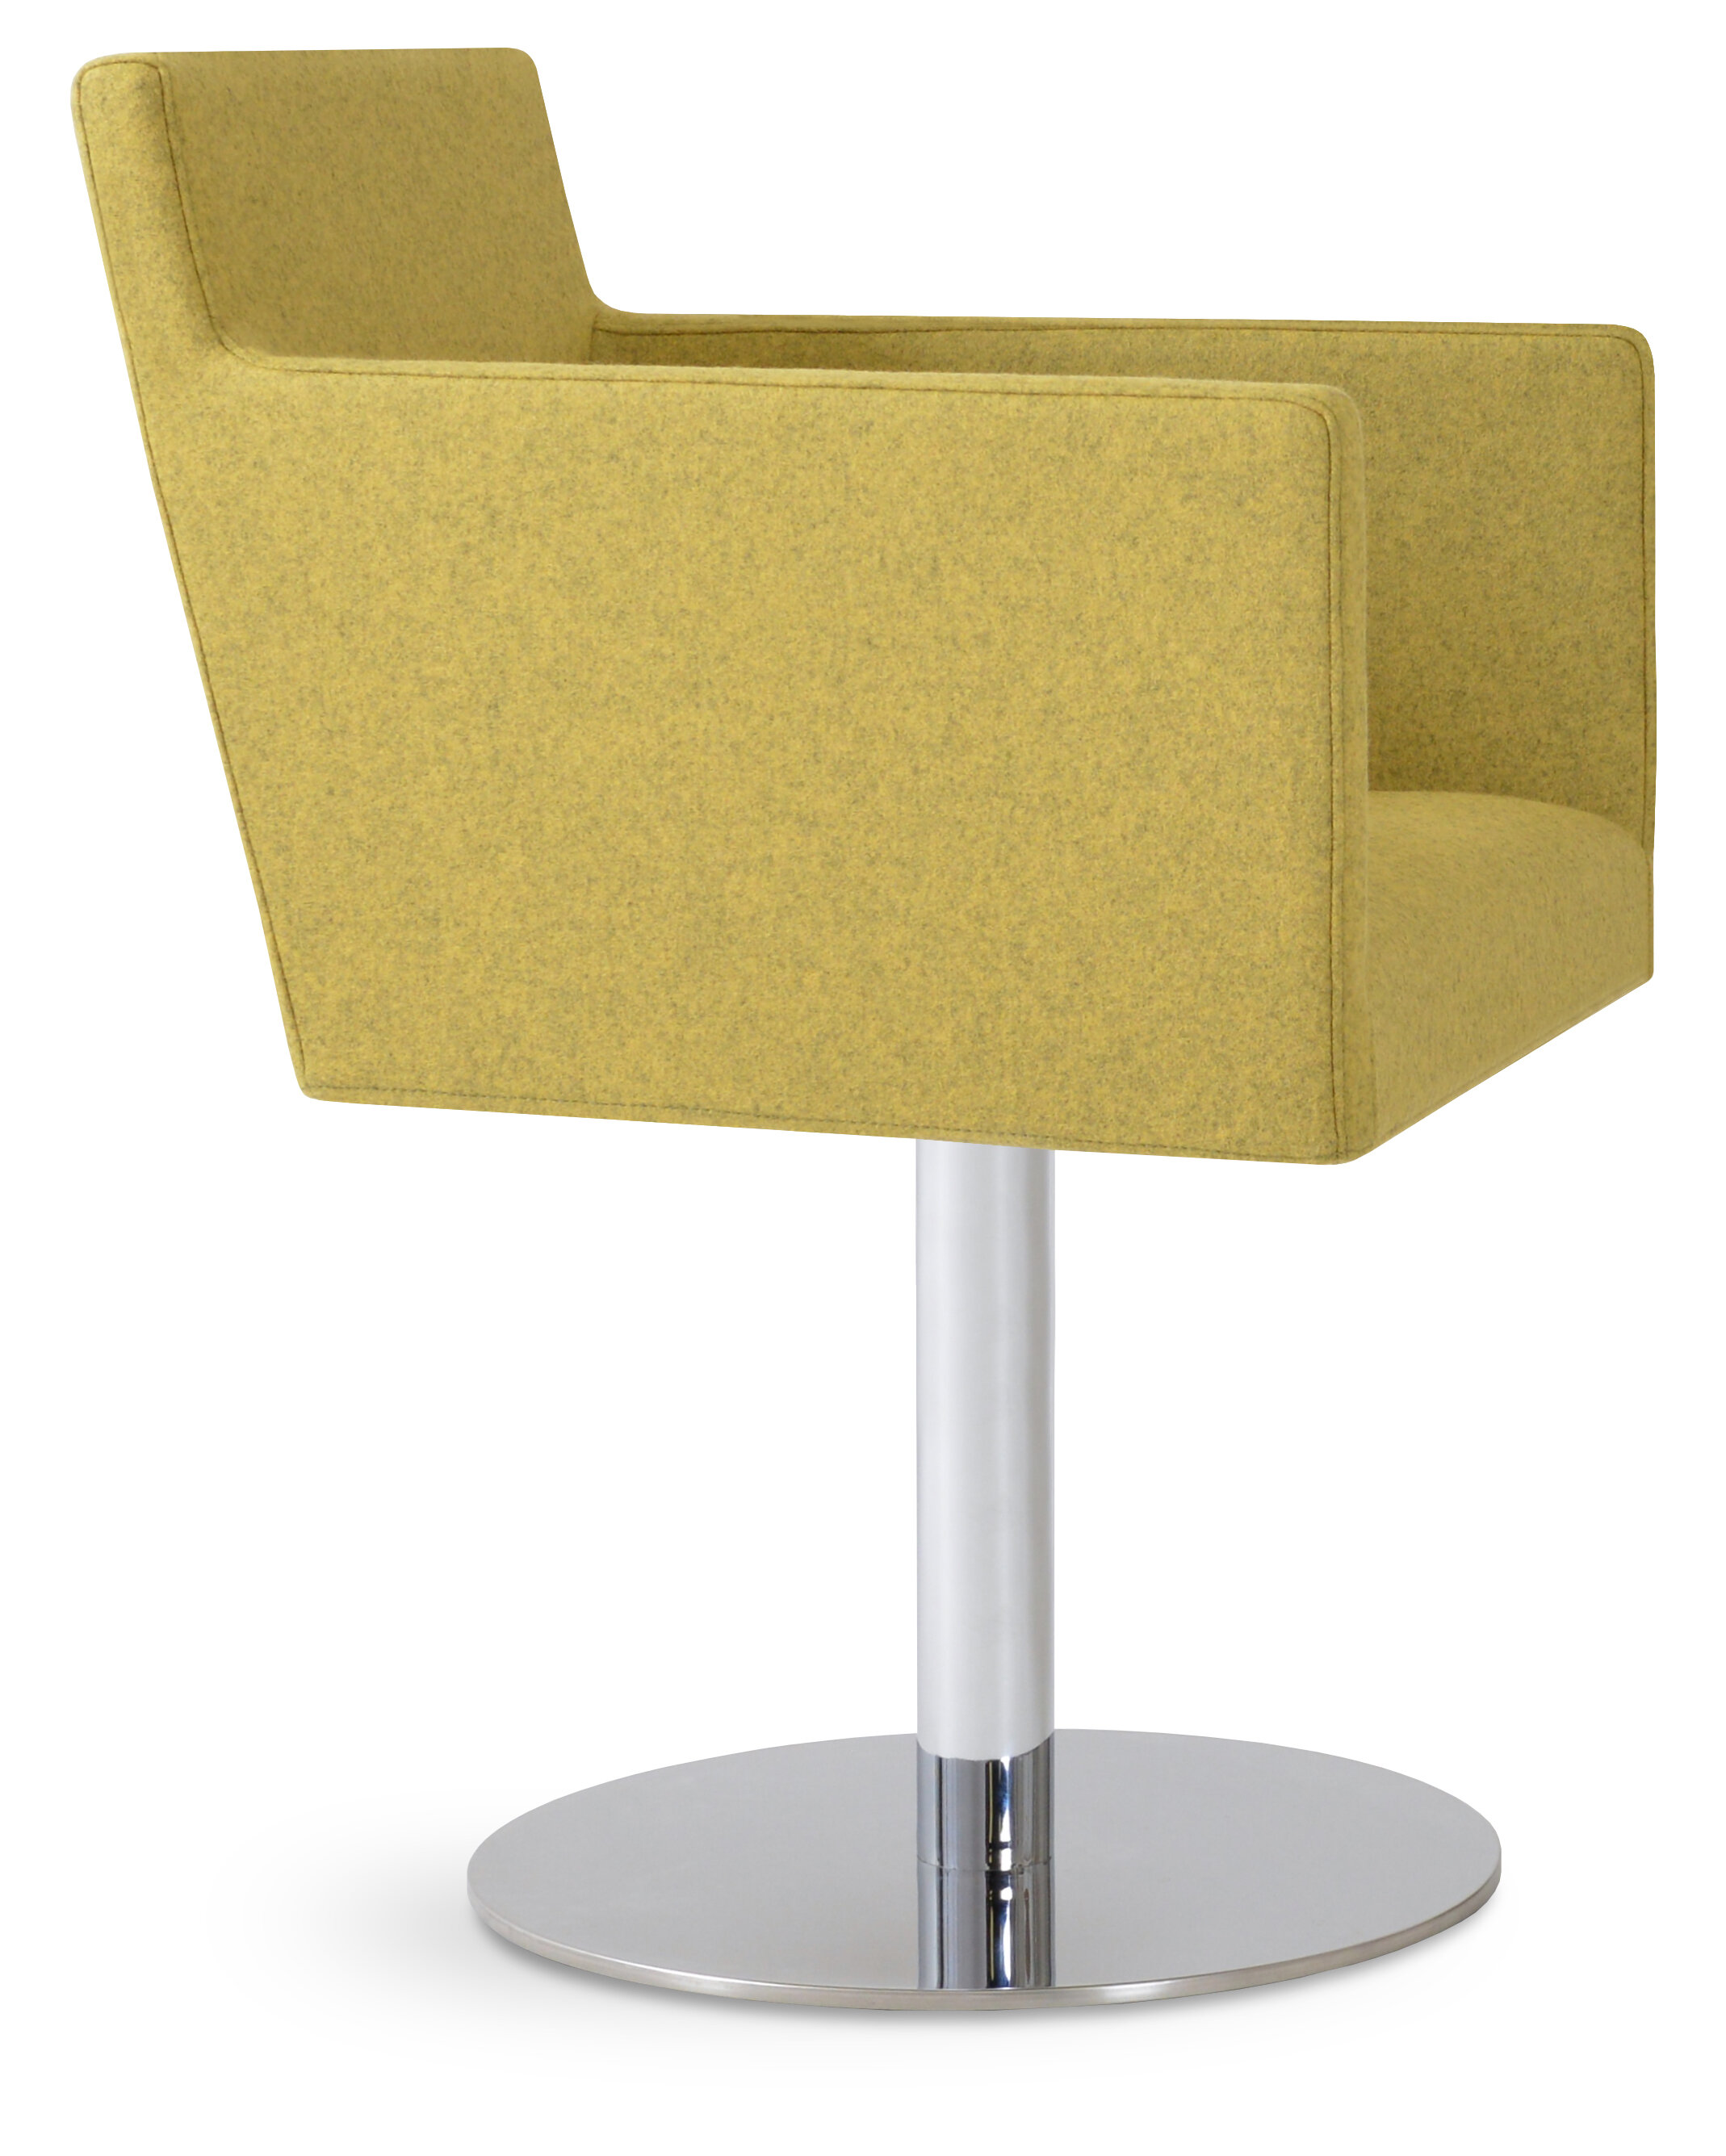 Ordinaire SohoConcept Harput Swivel Round Armchair | Wayfair